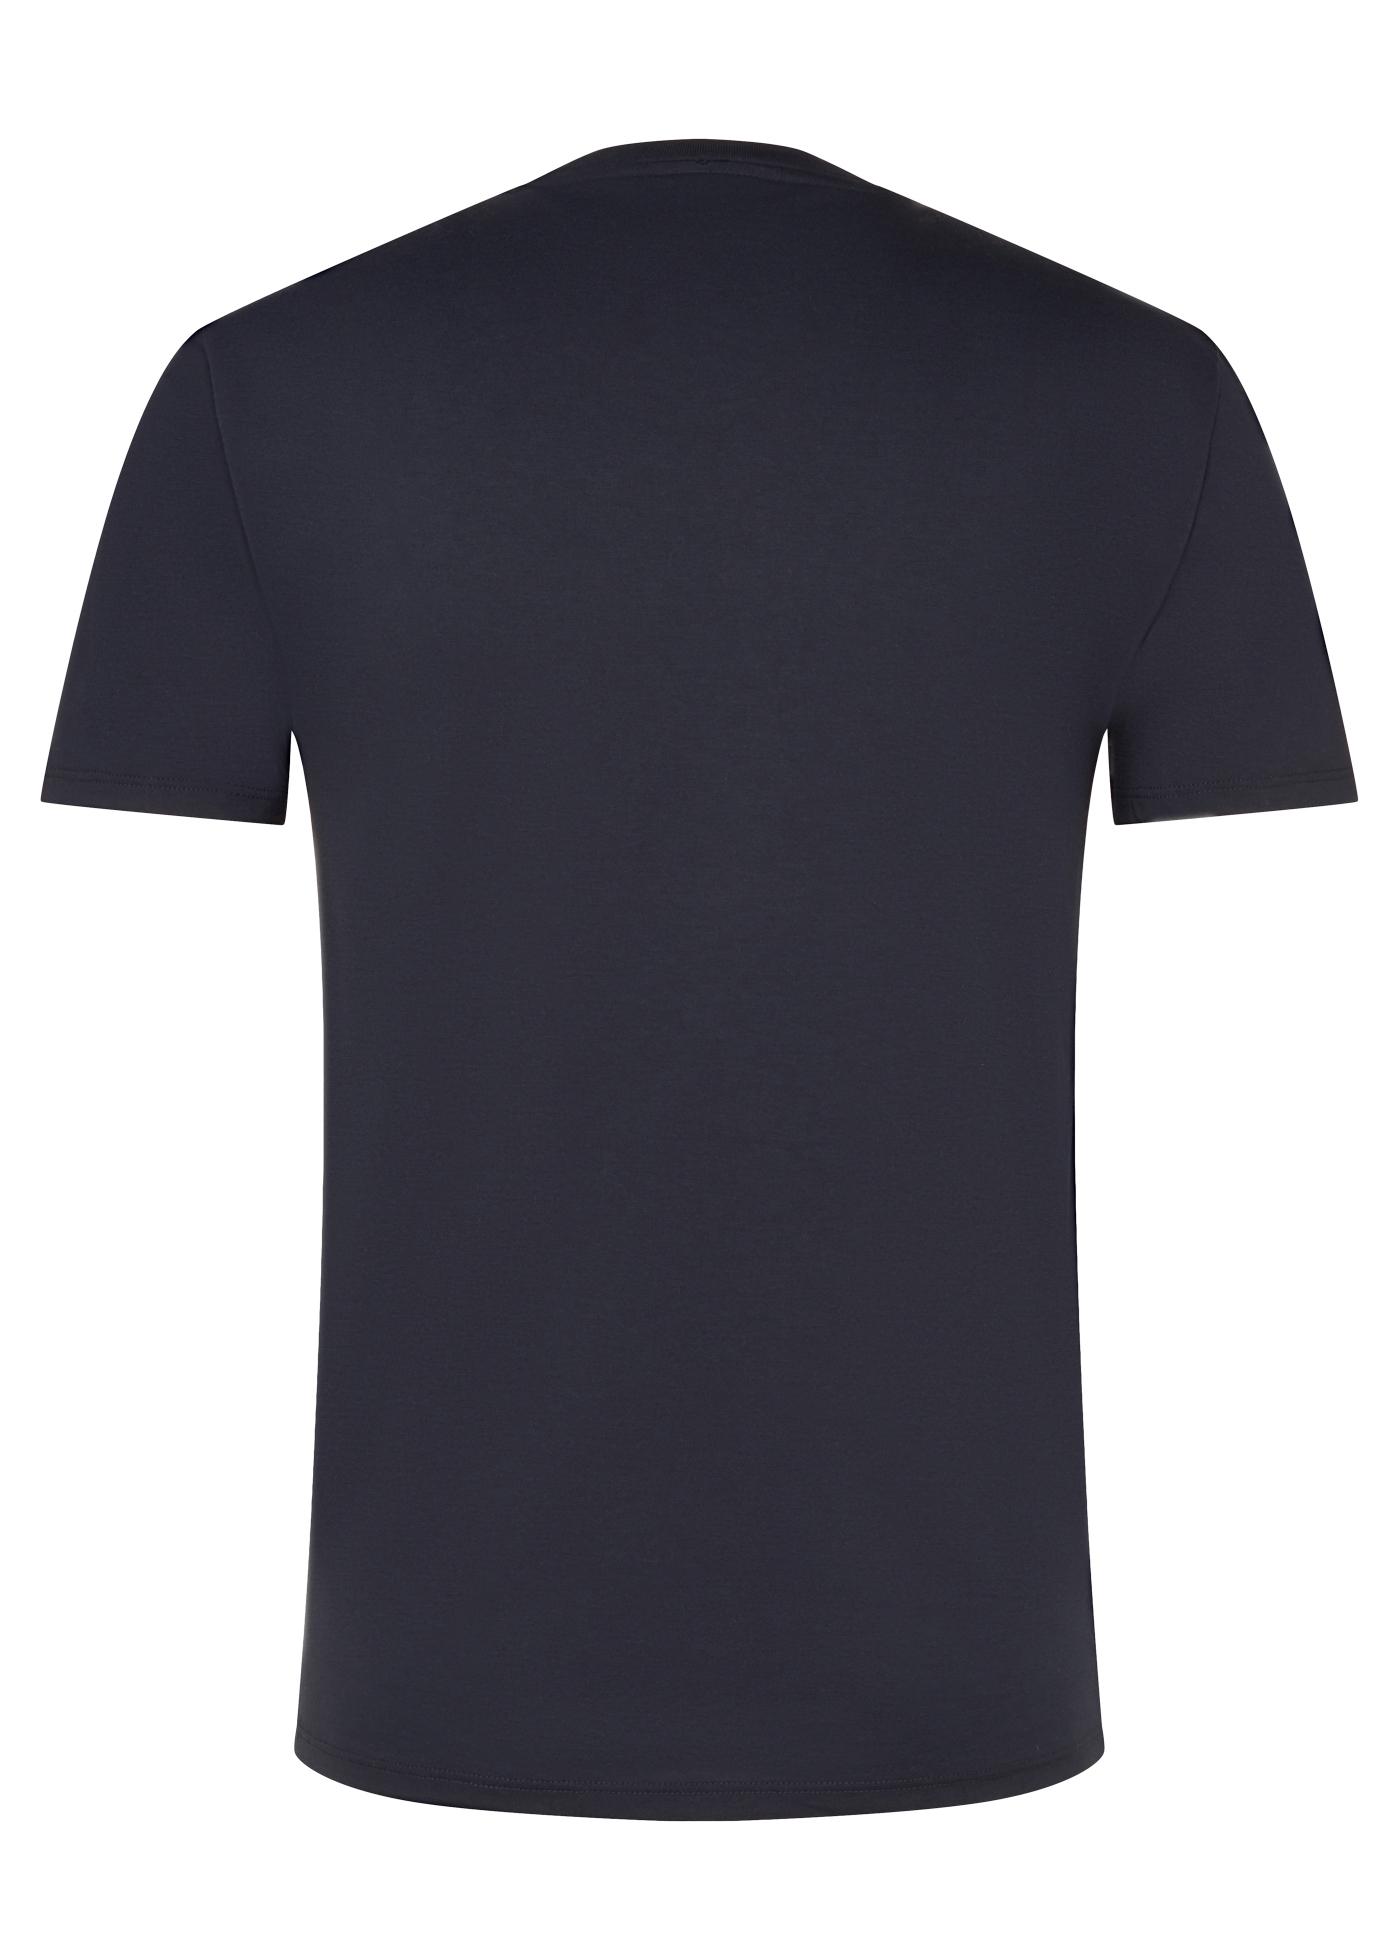 Tee-Shirt image number 1